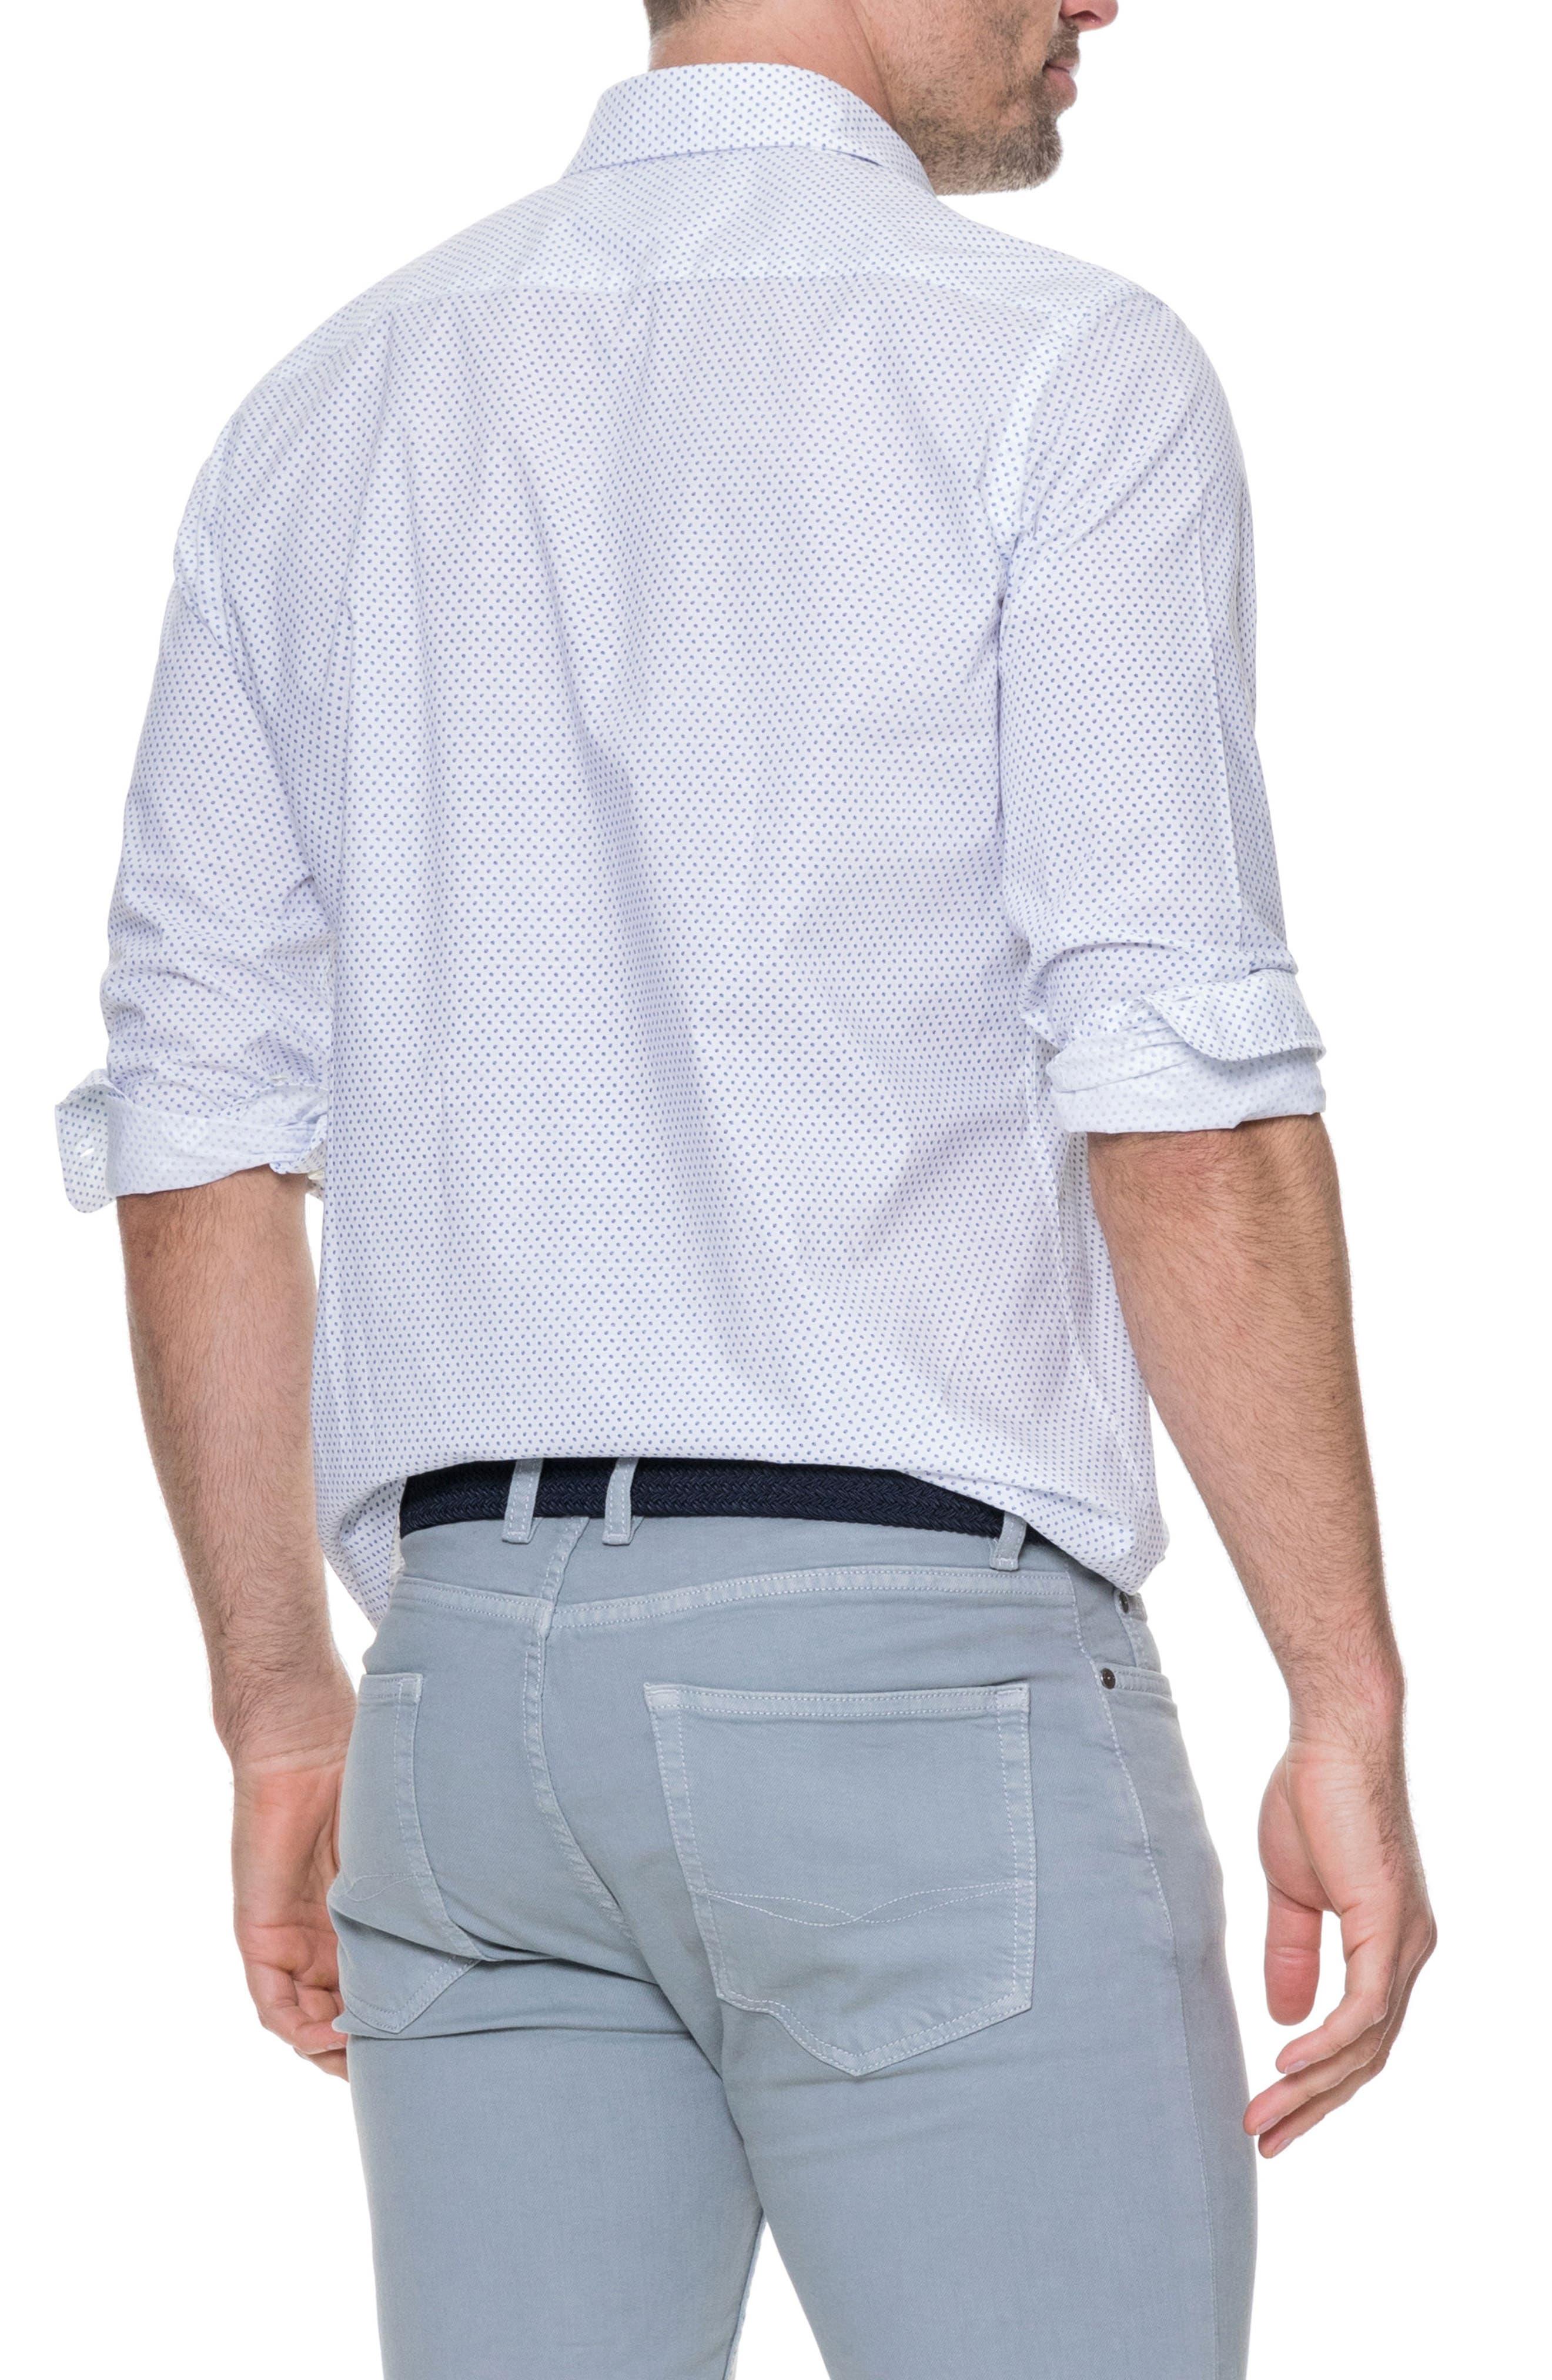 Butler Point Slim Fit Sport Shirt,                             Alternate thumbnail 3, color,                             Snow